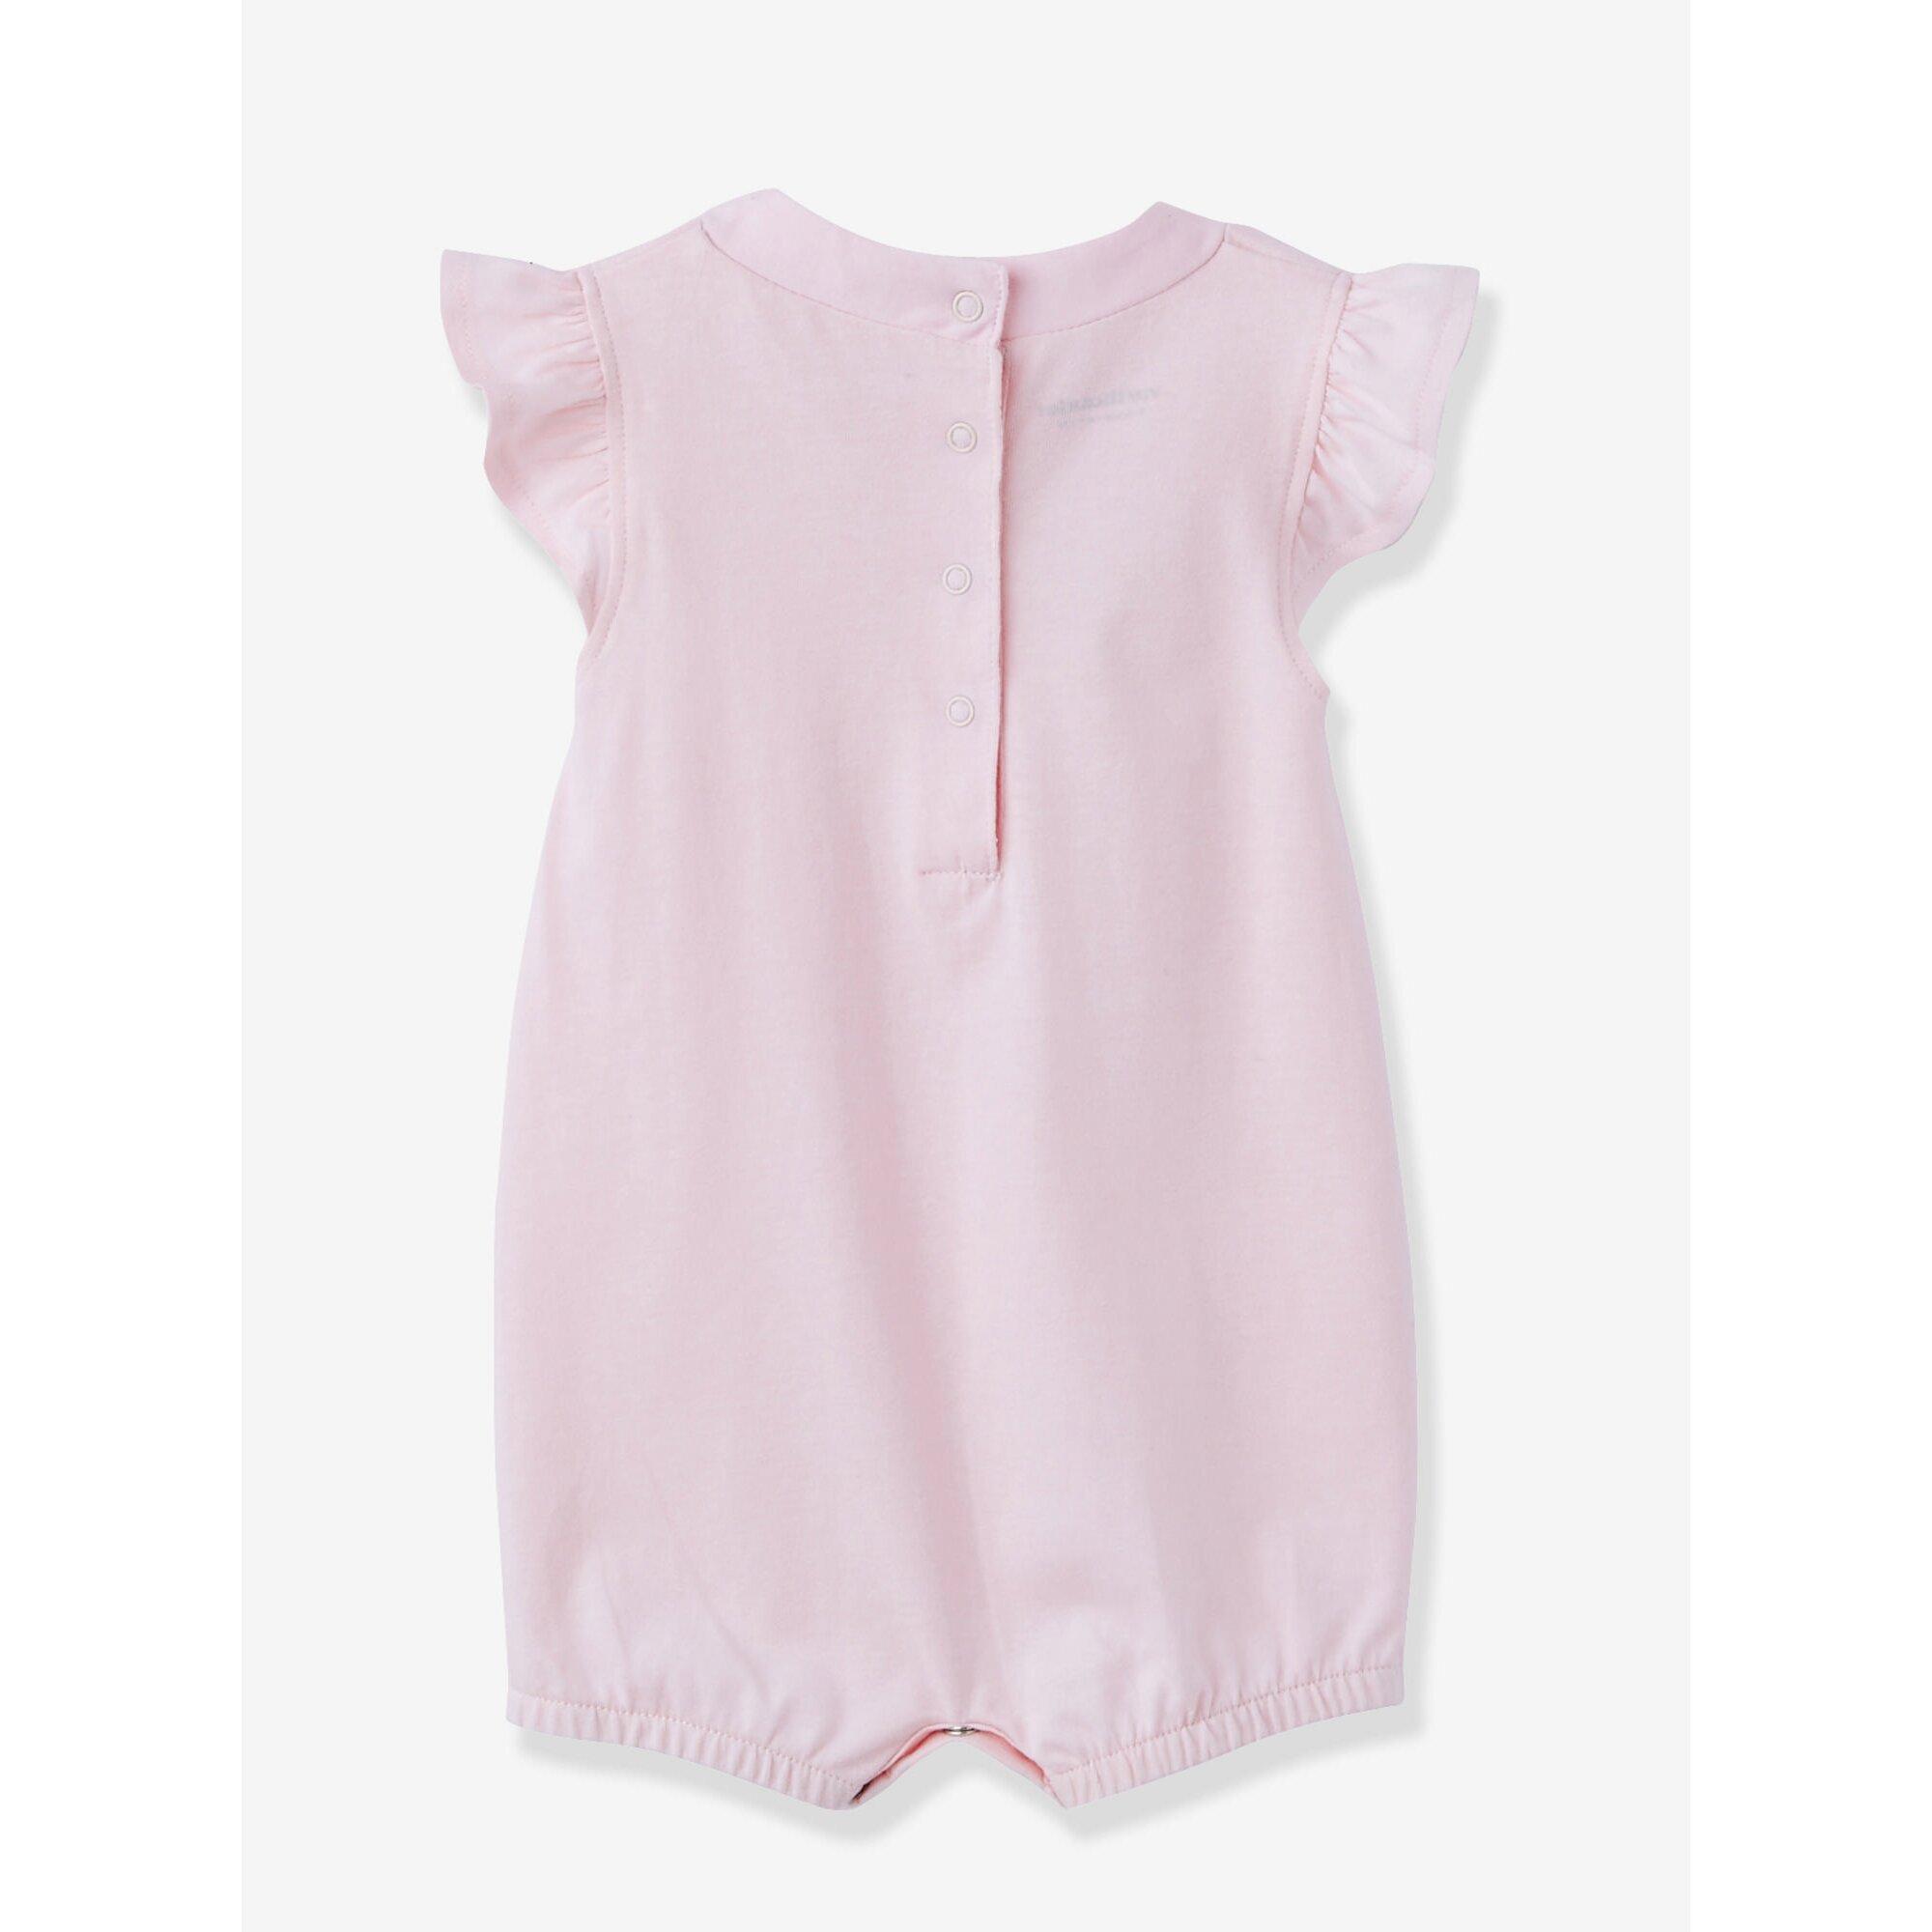 vertbaudet-2er-pack-kurze-jumpsuits-baby-madchen